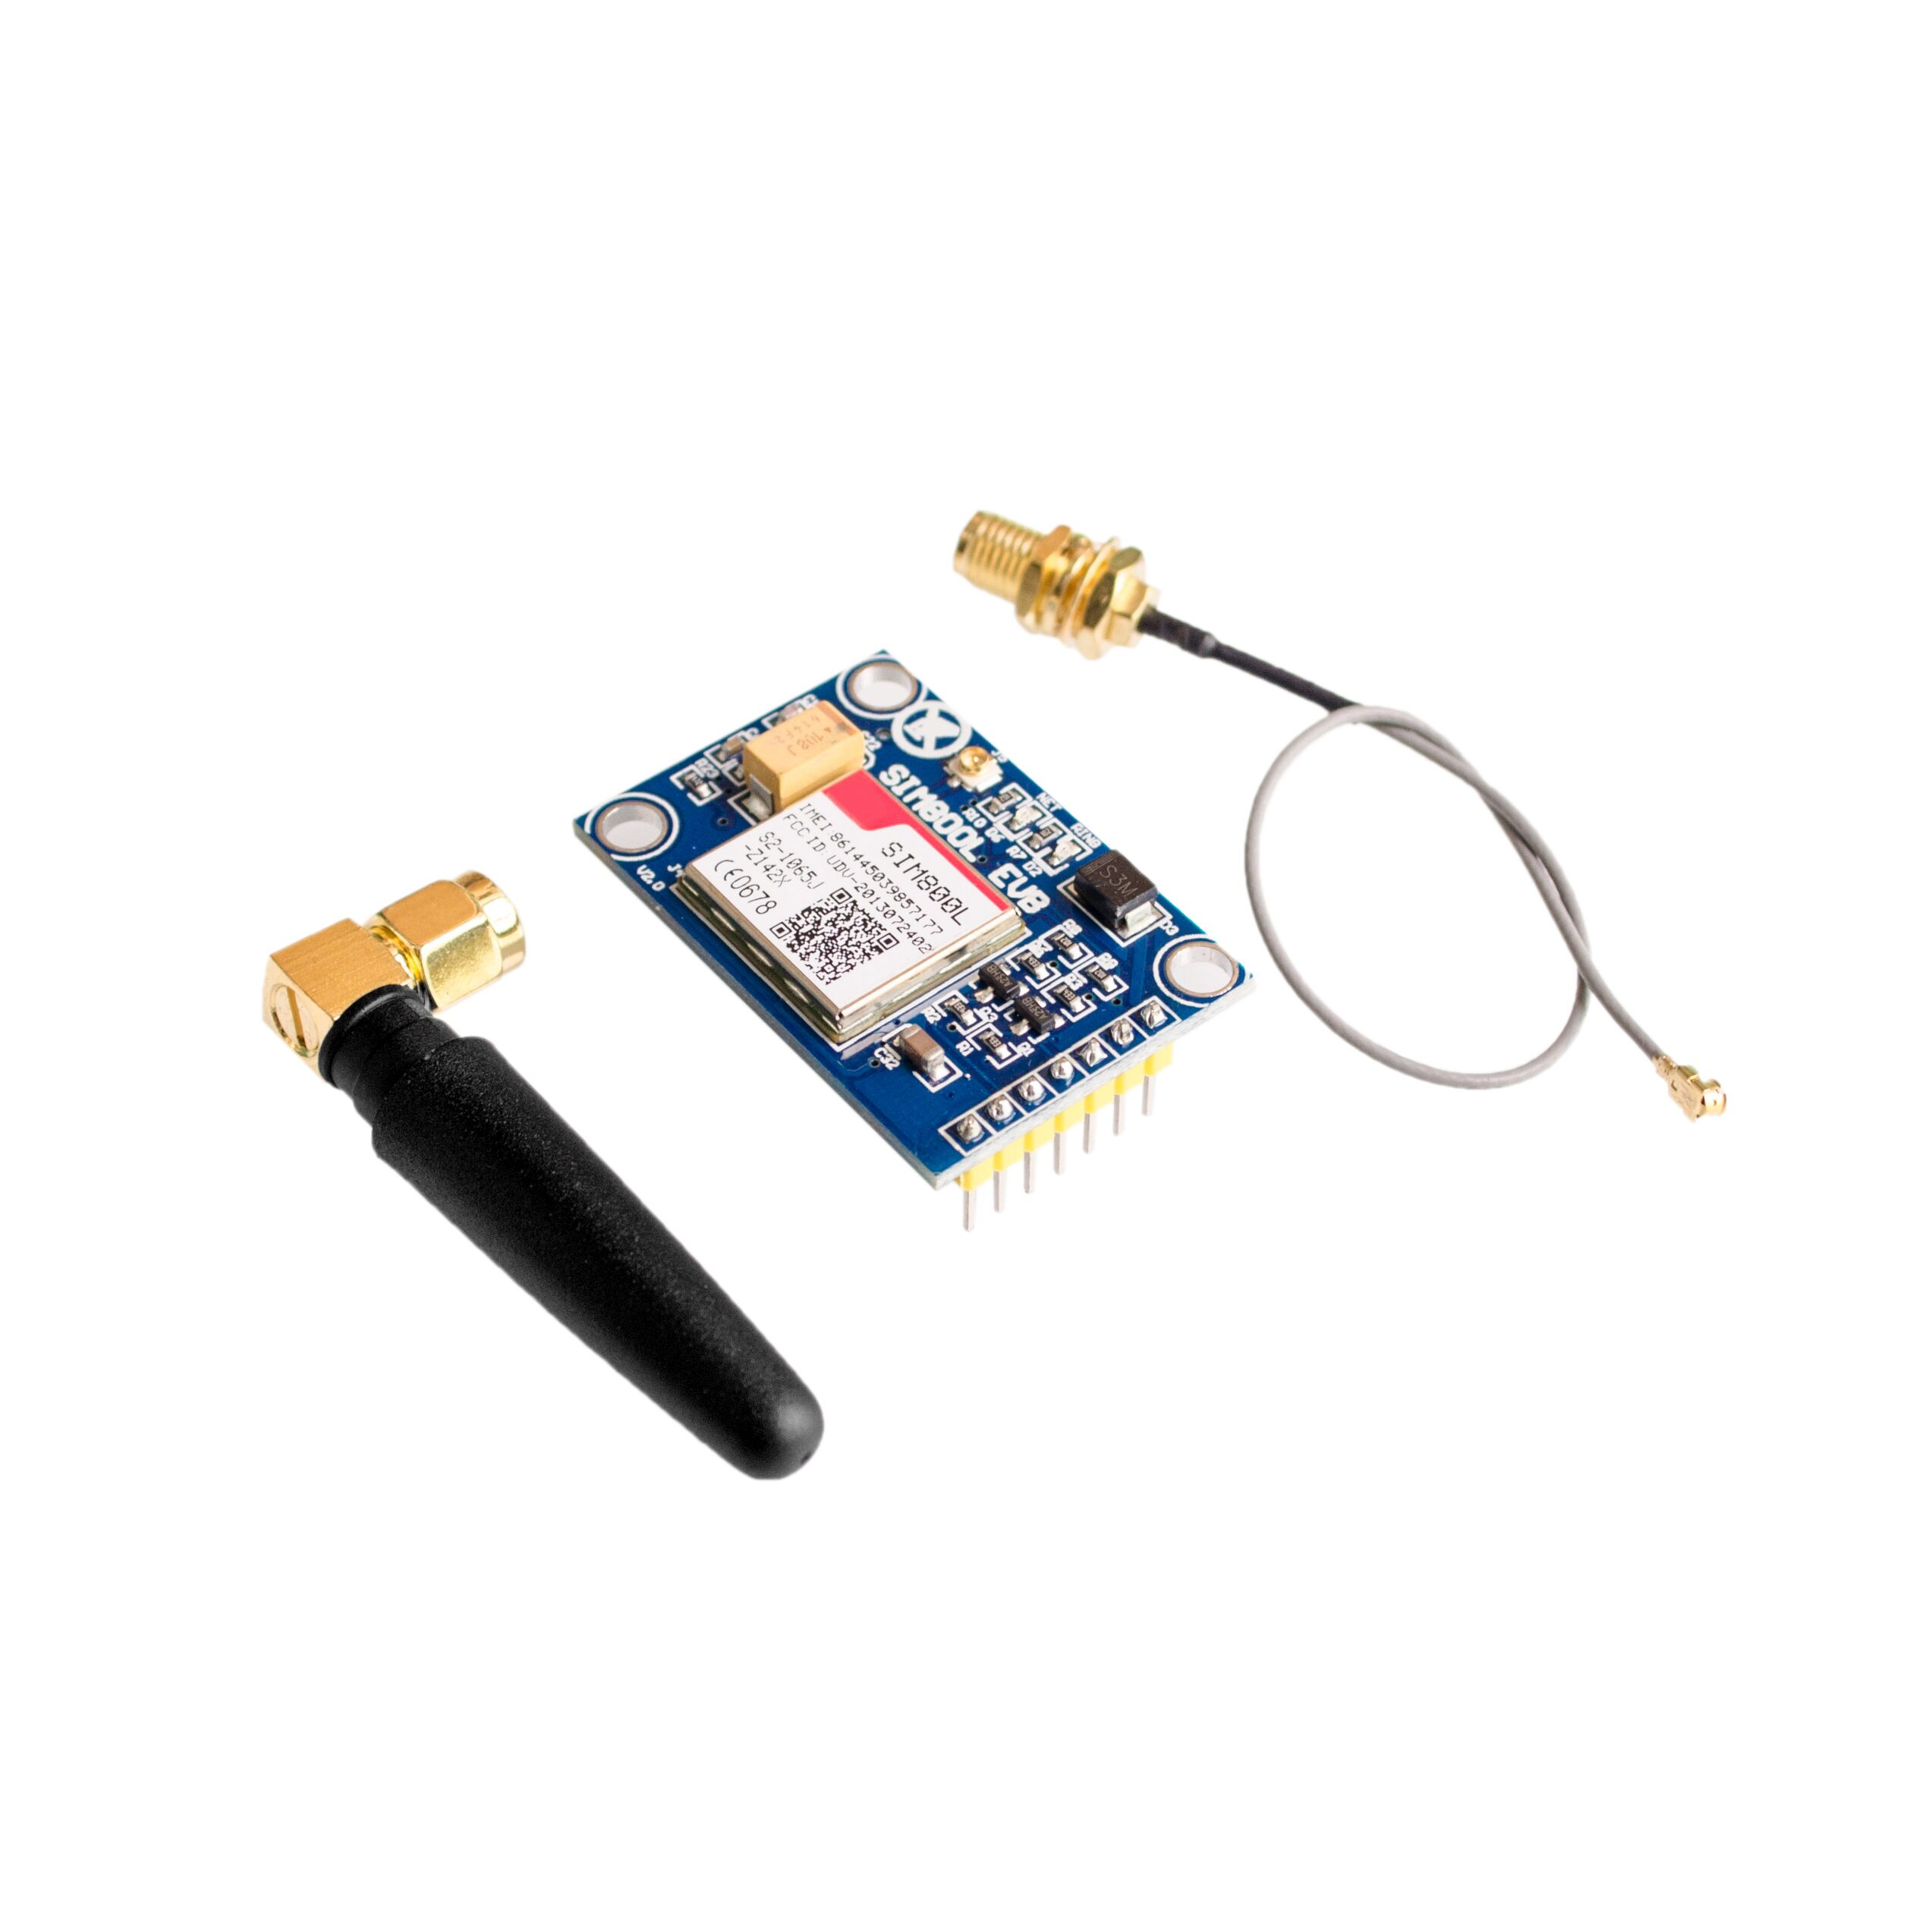 new-sim800l-gprs-gsm-module-w-pcb-antenna-sim-board-quad-band-for-font-b-arduino-b-font